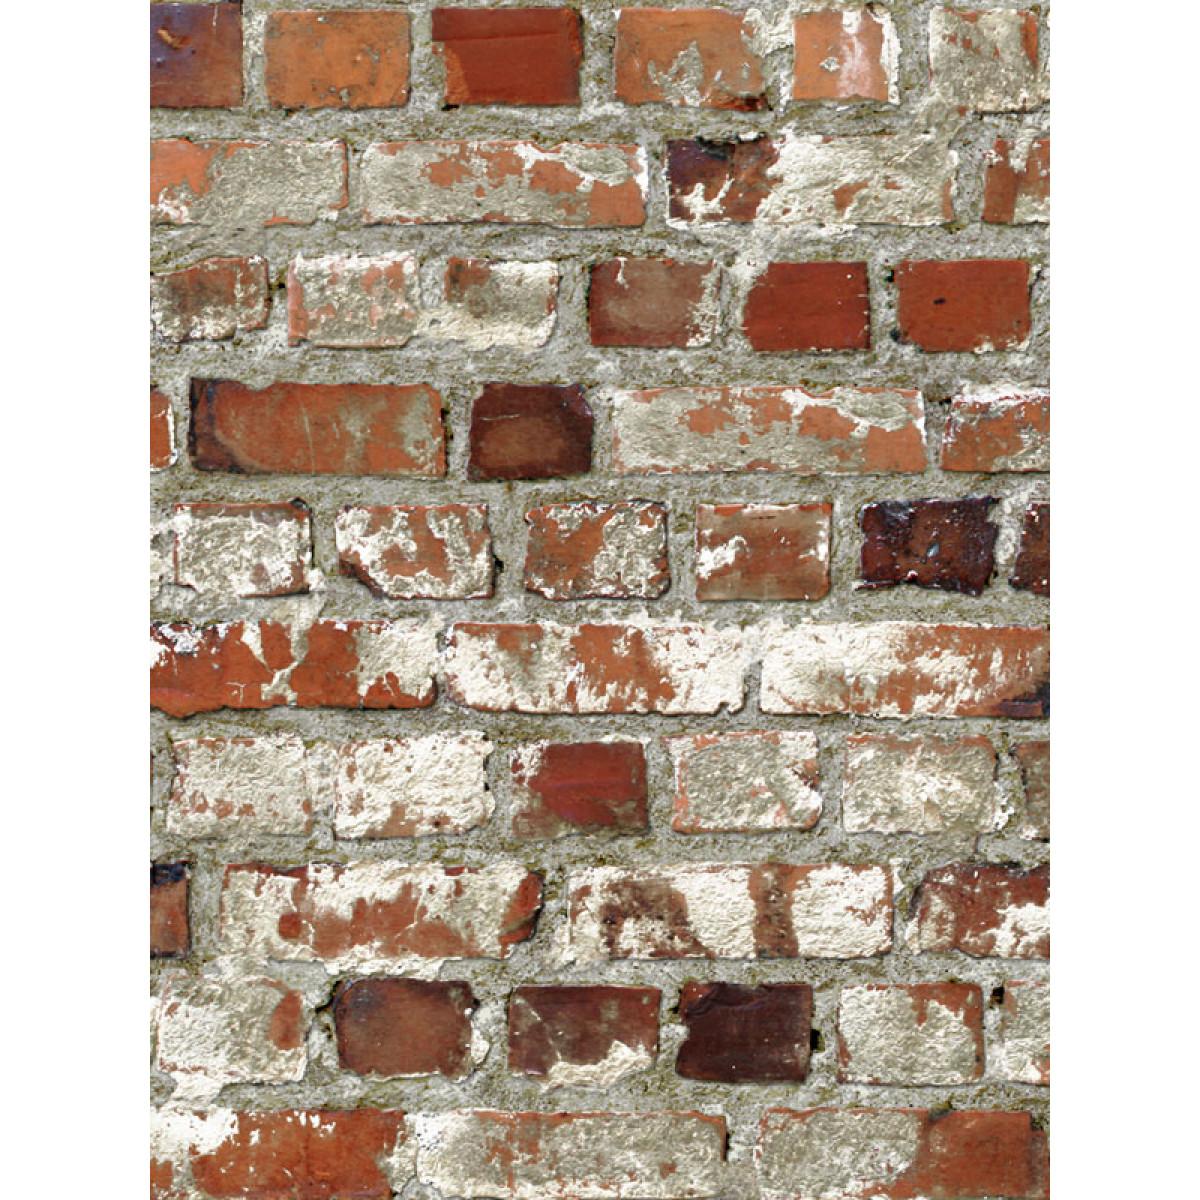 muriva loft red brick wallpaper 102538. Black Bedroom Furniture Sets. Home Design Ideas